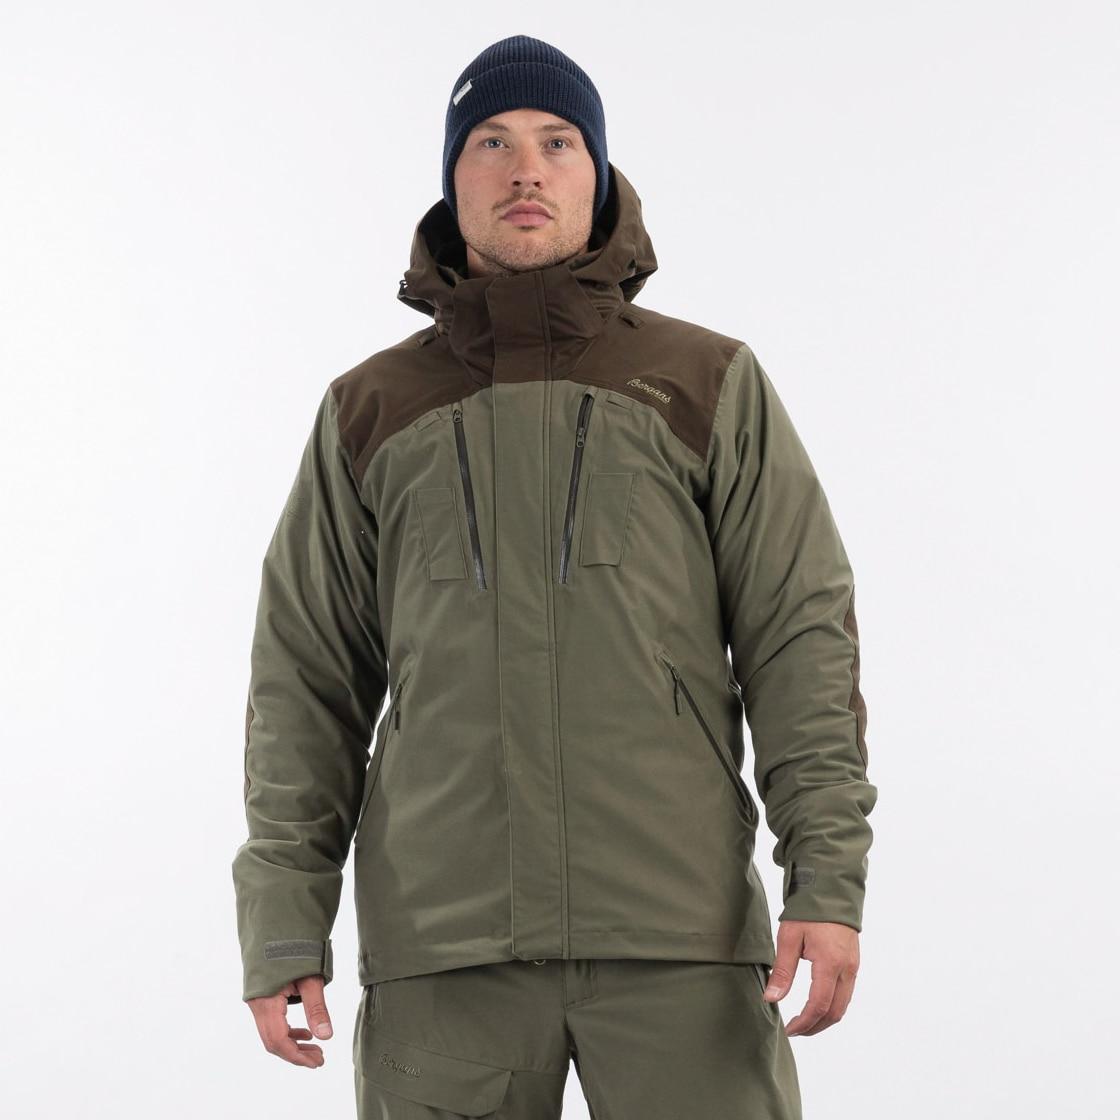 Hogna V2 2L Jacket